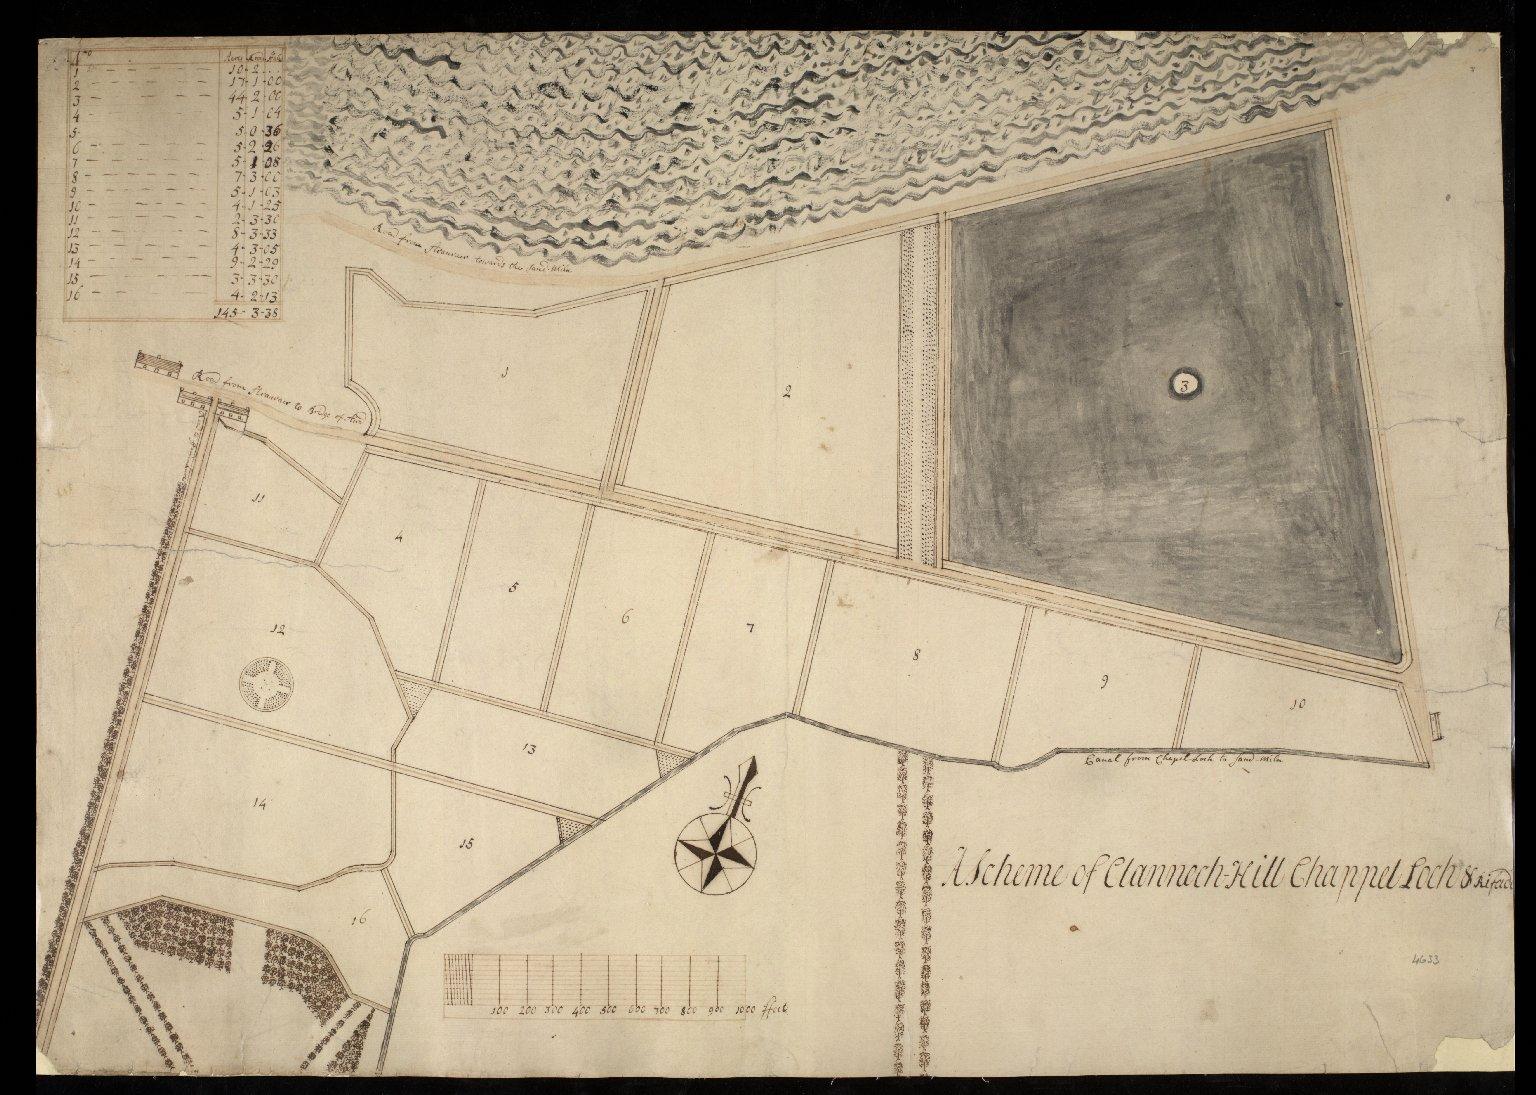 A Scheme of Clannech Hill Chappel Loch & Rifade [1 of 1]